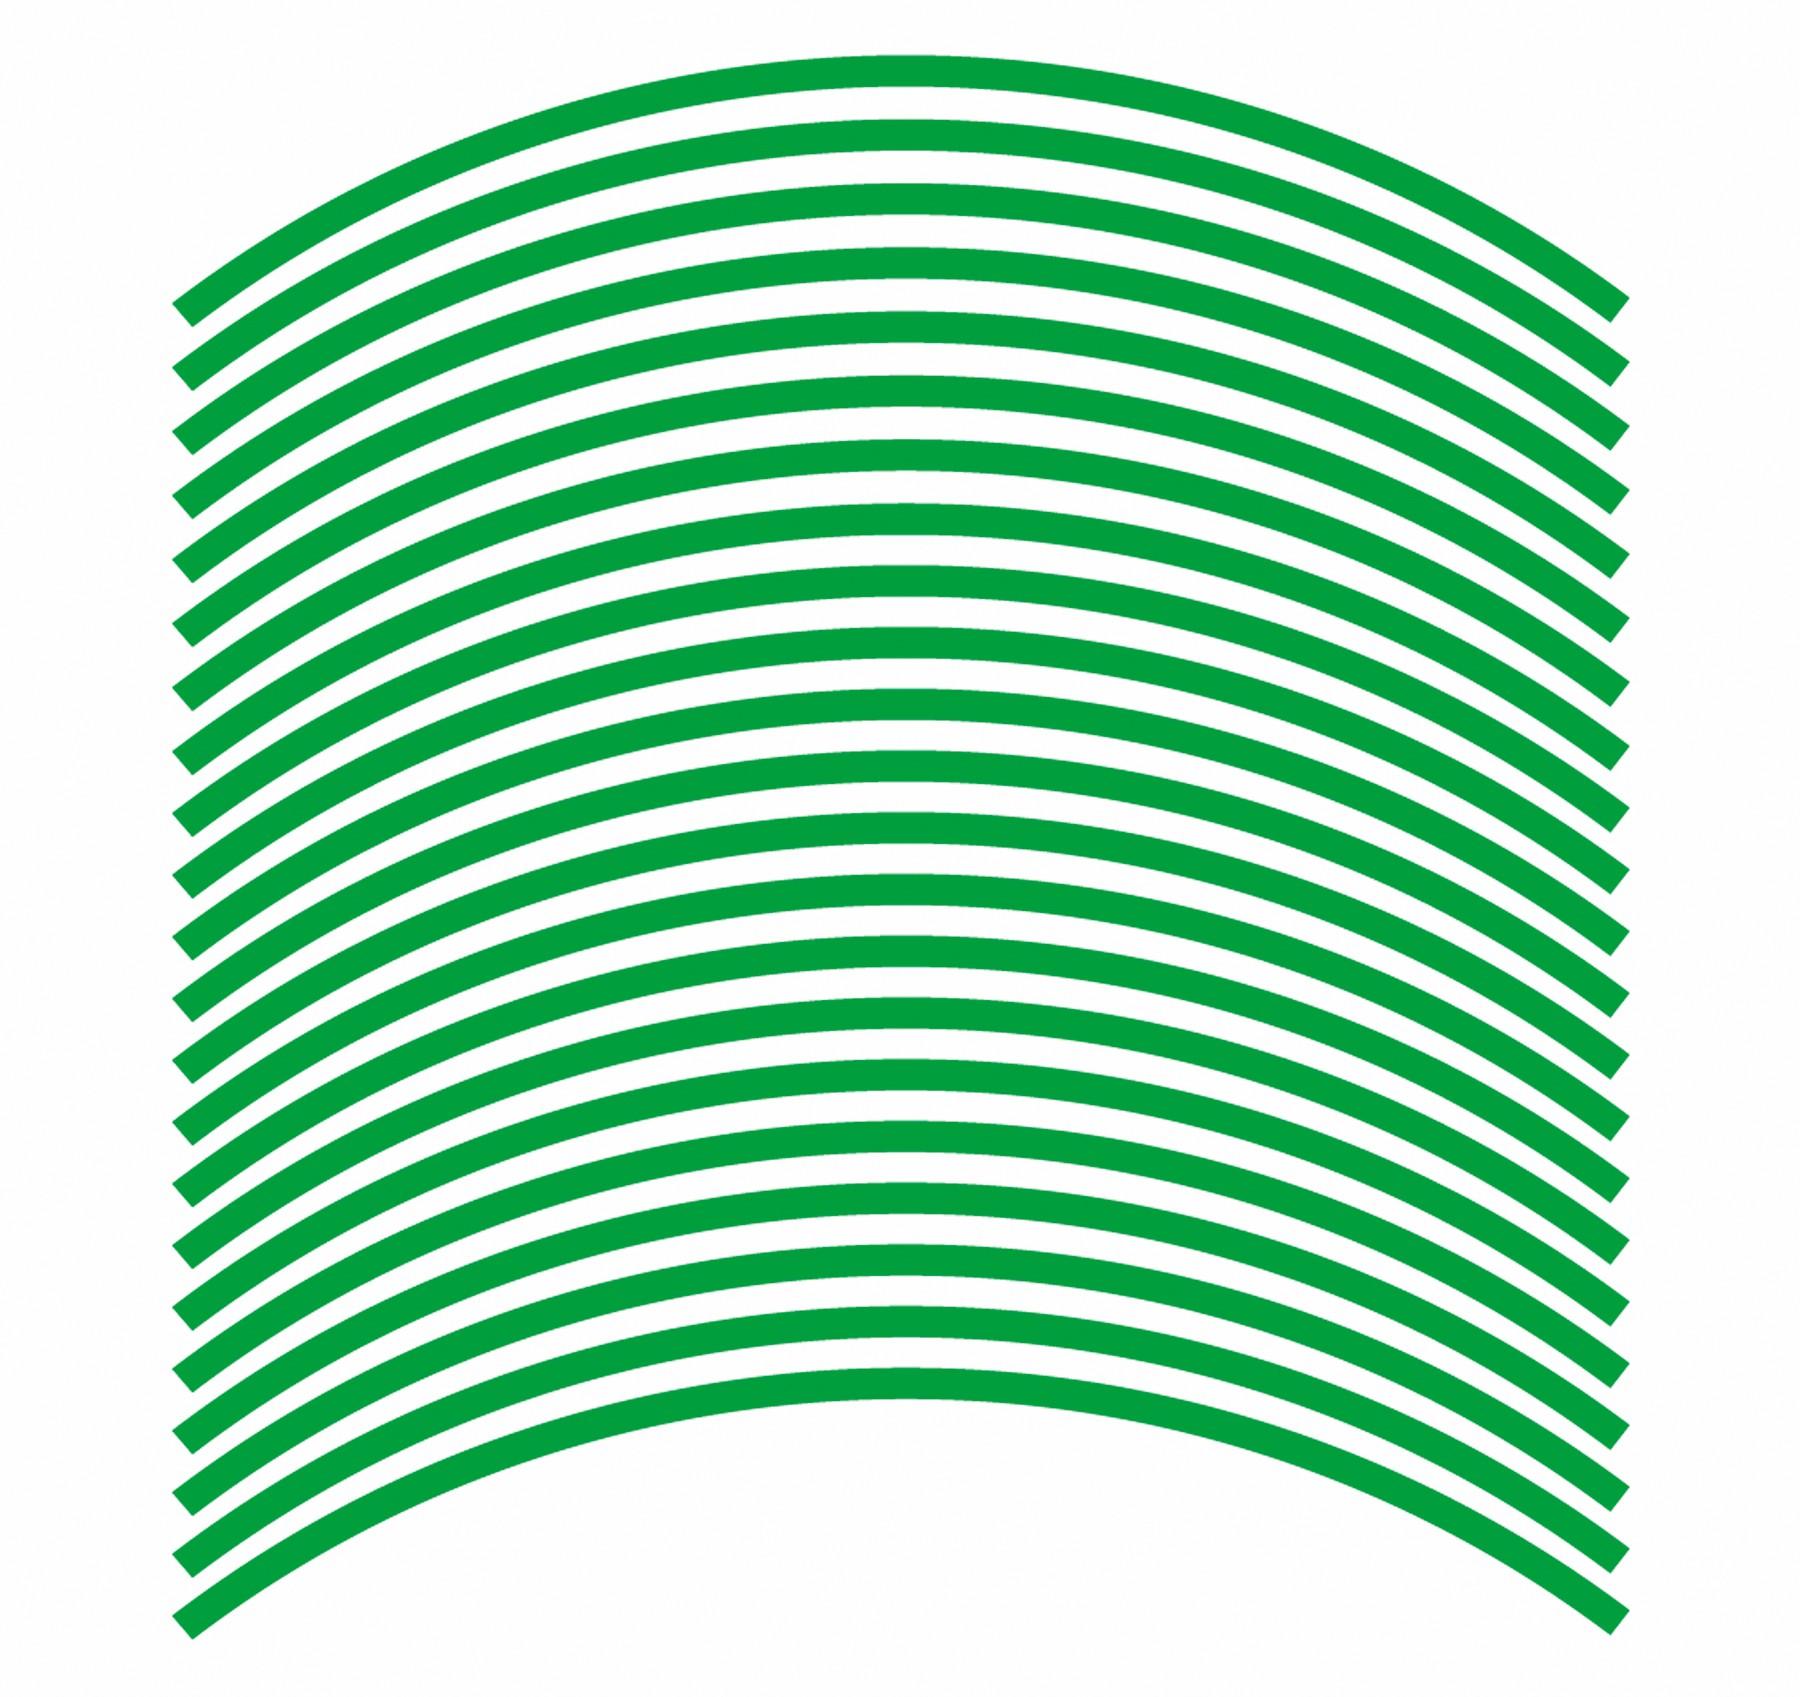 Felgenrandaufkleber 6 mm grün 17 Zoll